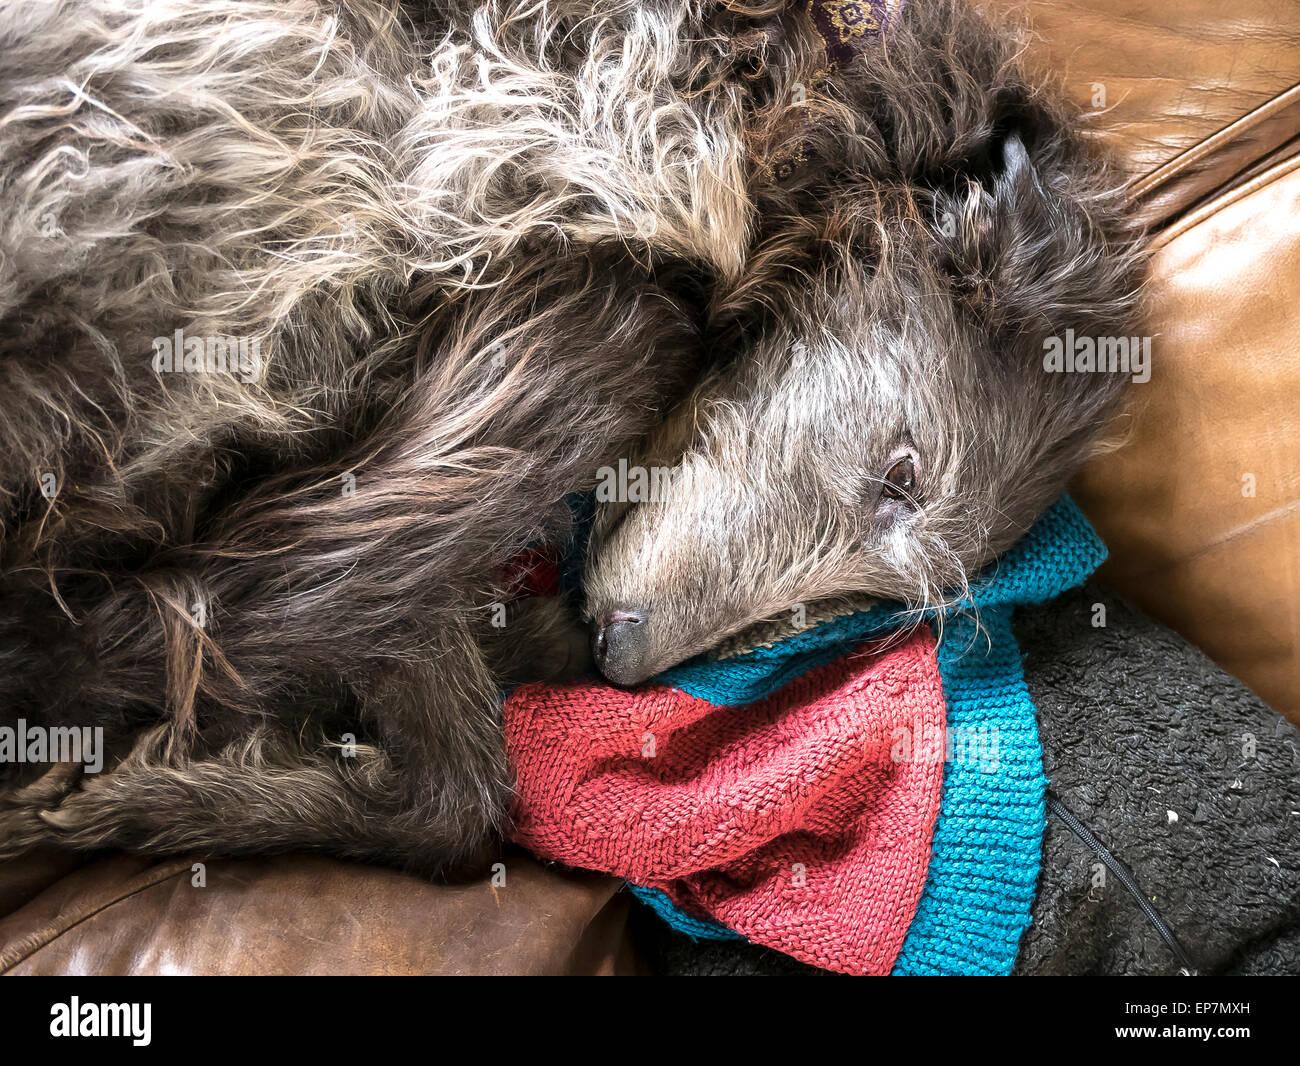 Old deerhound dog resting - Stock Image